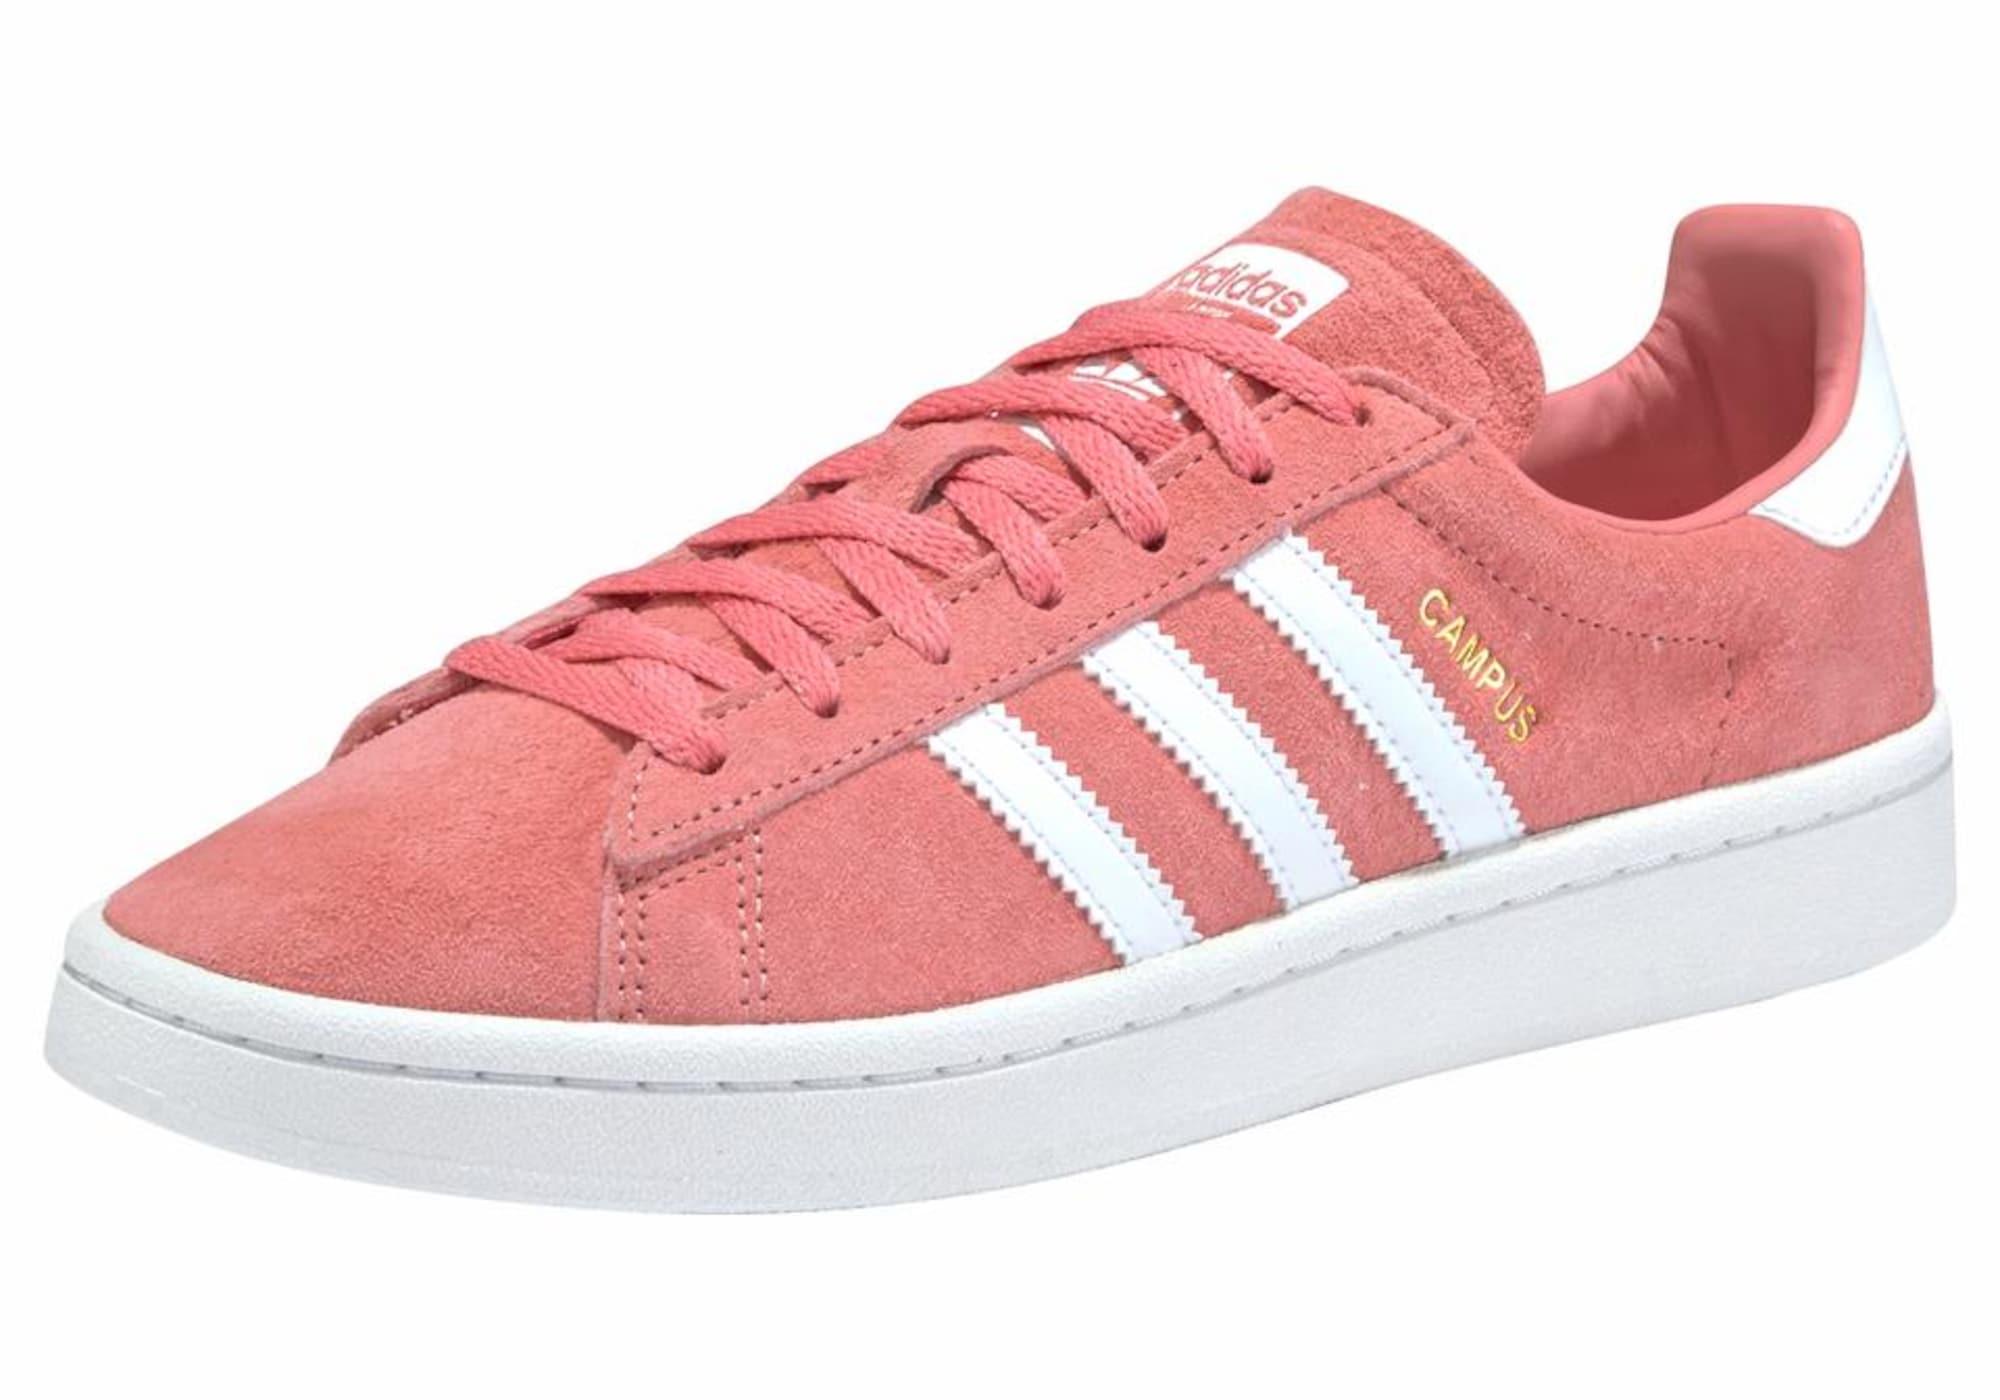 ADIDAS ORIGINALS, Heren Sneakers laag 'Campus W Gum', rosé / wit